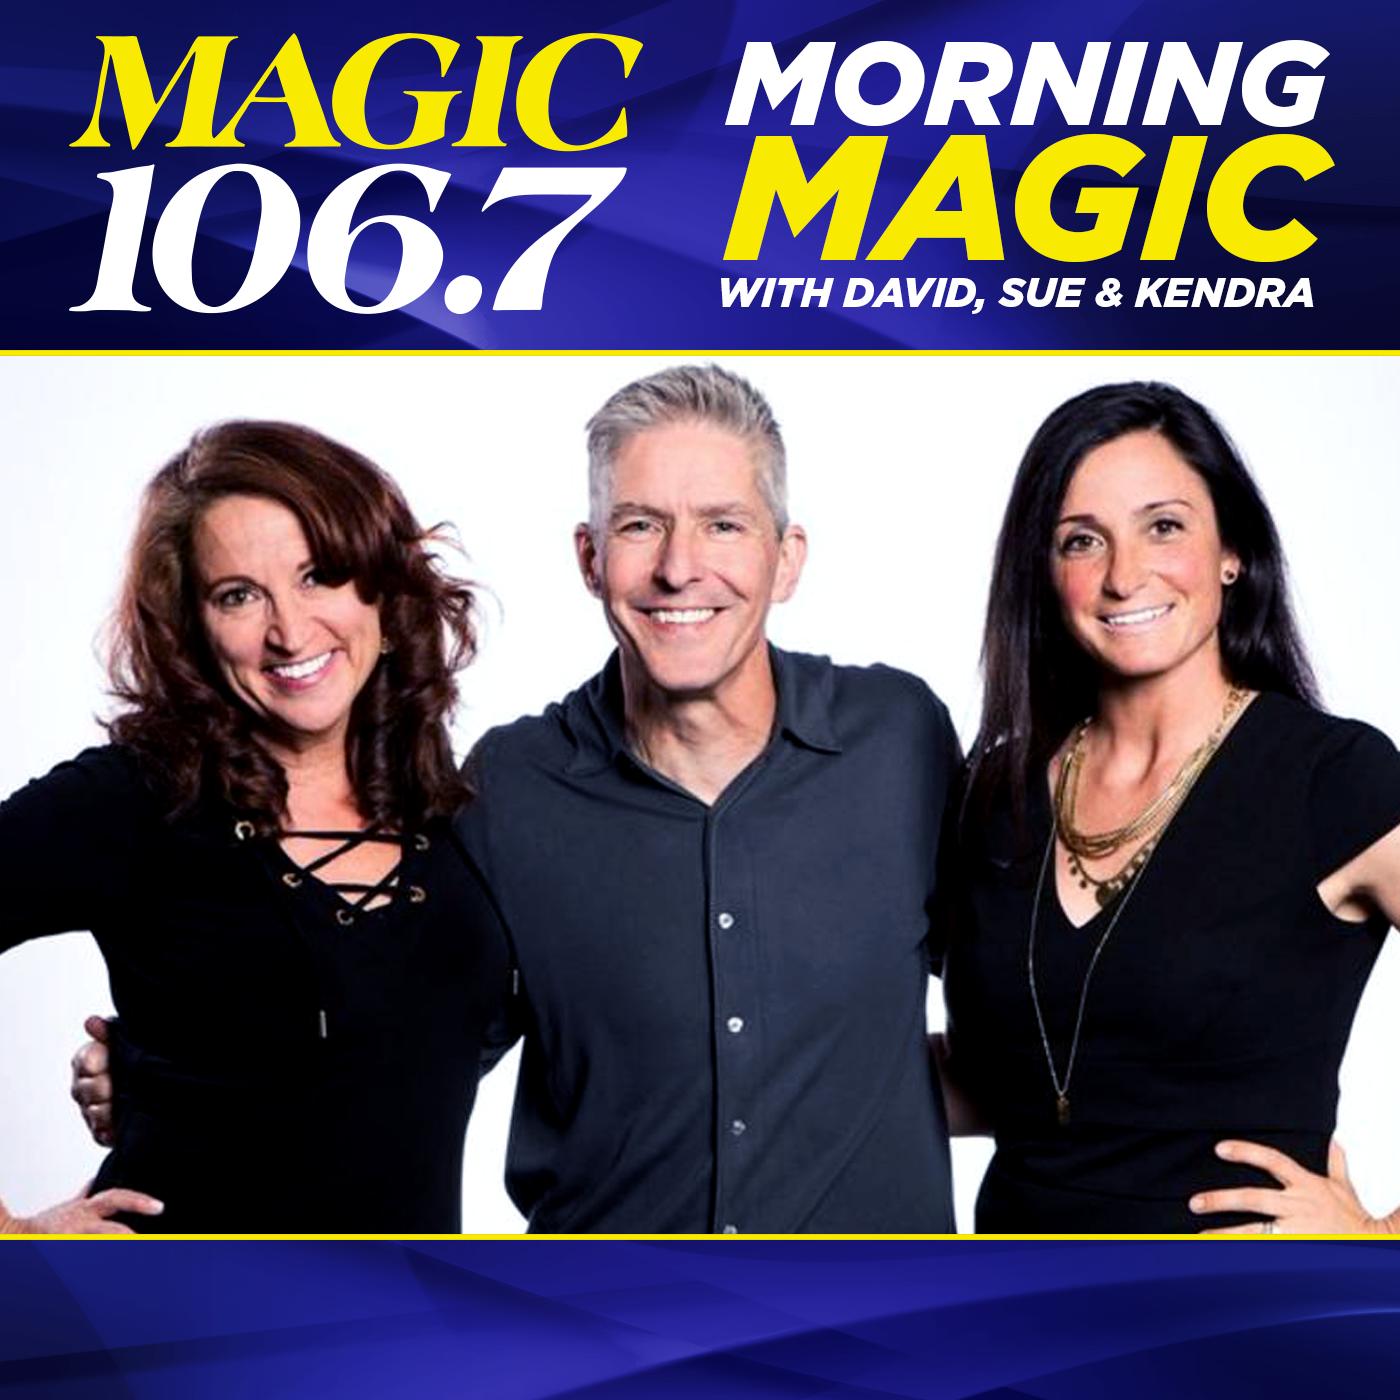 Morning MAGIC 1400x1400 REVISED